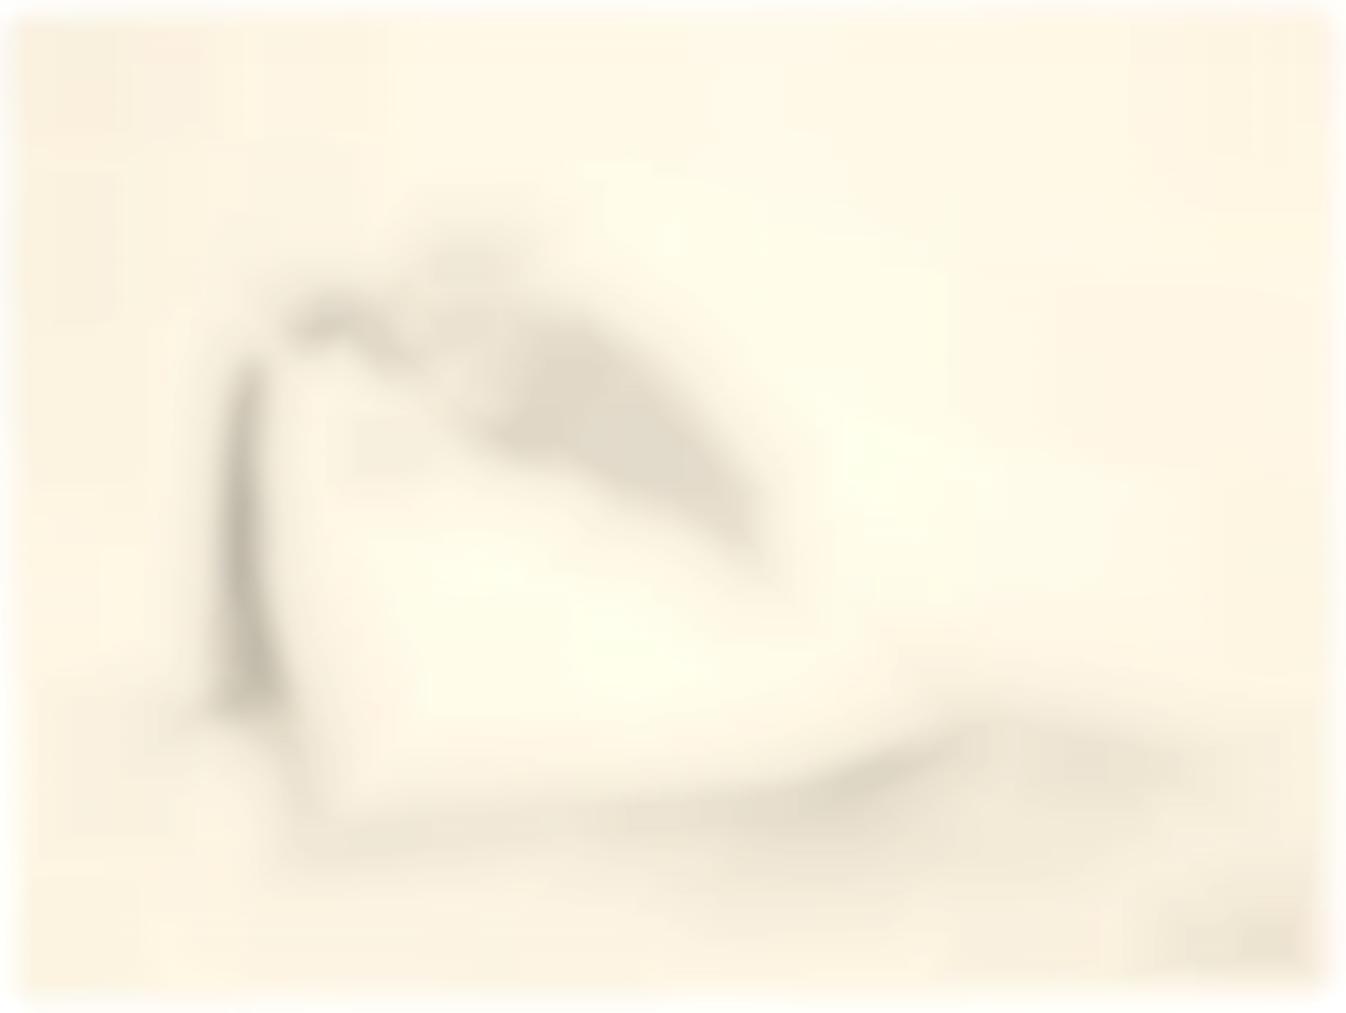 David Hockney-Boodgie-1993